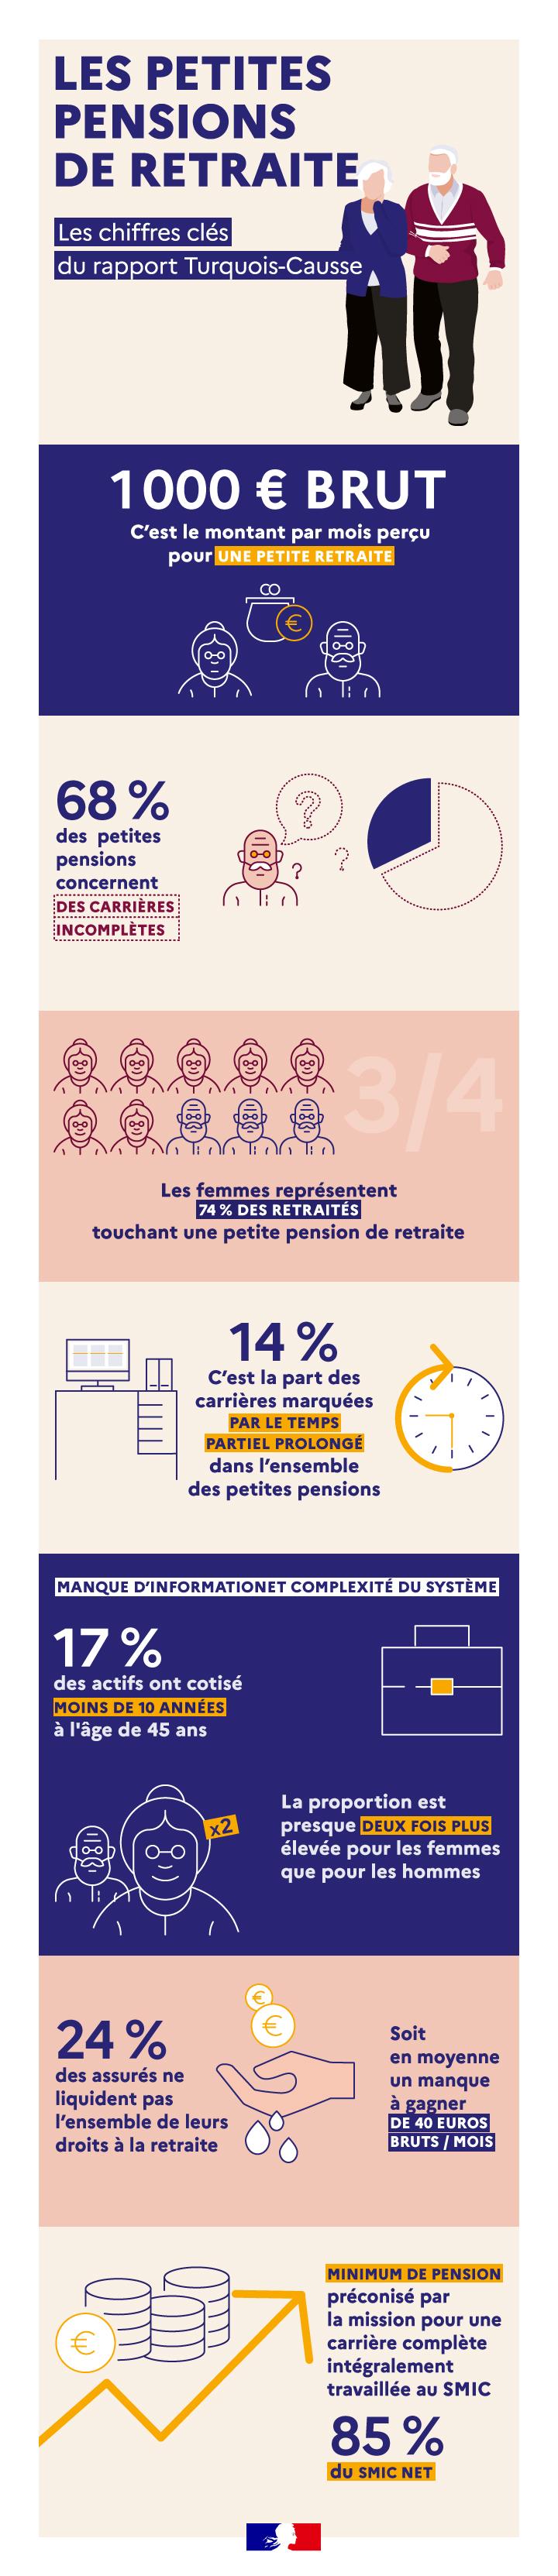 infographie-rapport-turquois-et-causse_web